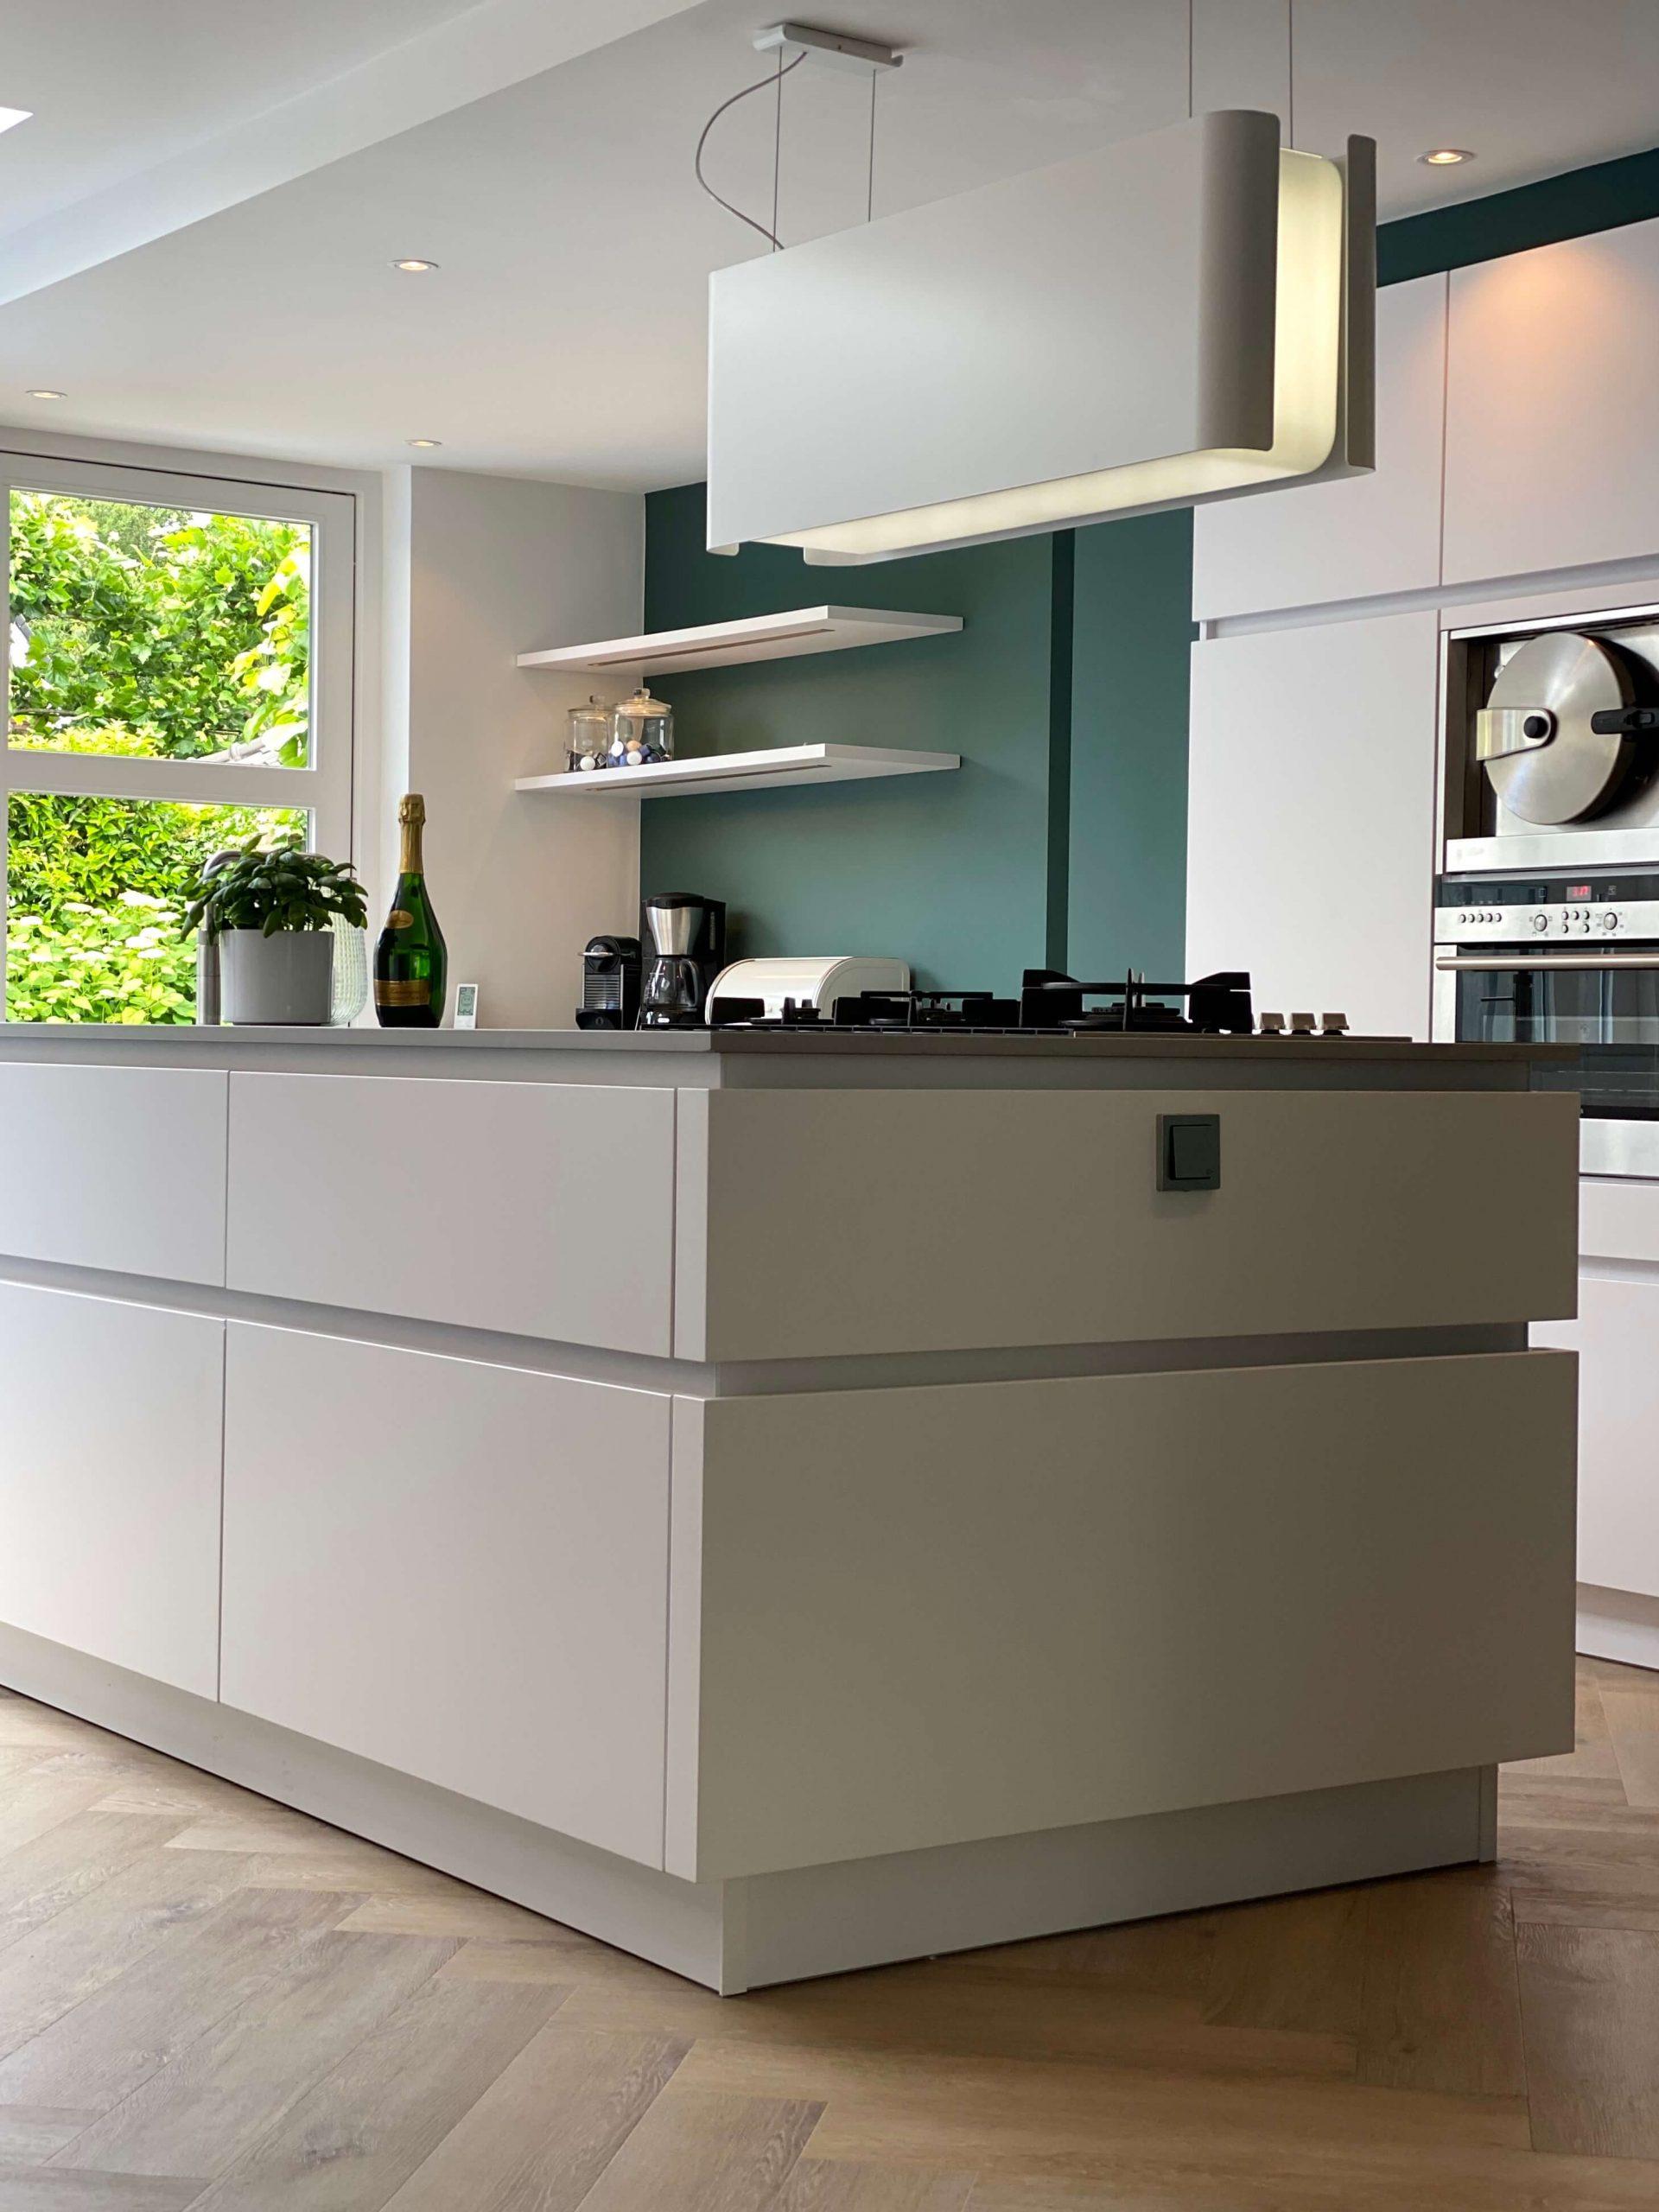 wildhagen leicht designkeuken met wit greeploos kookeiland